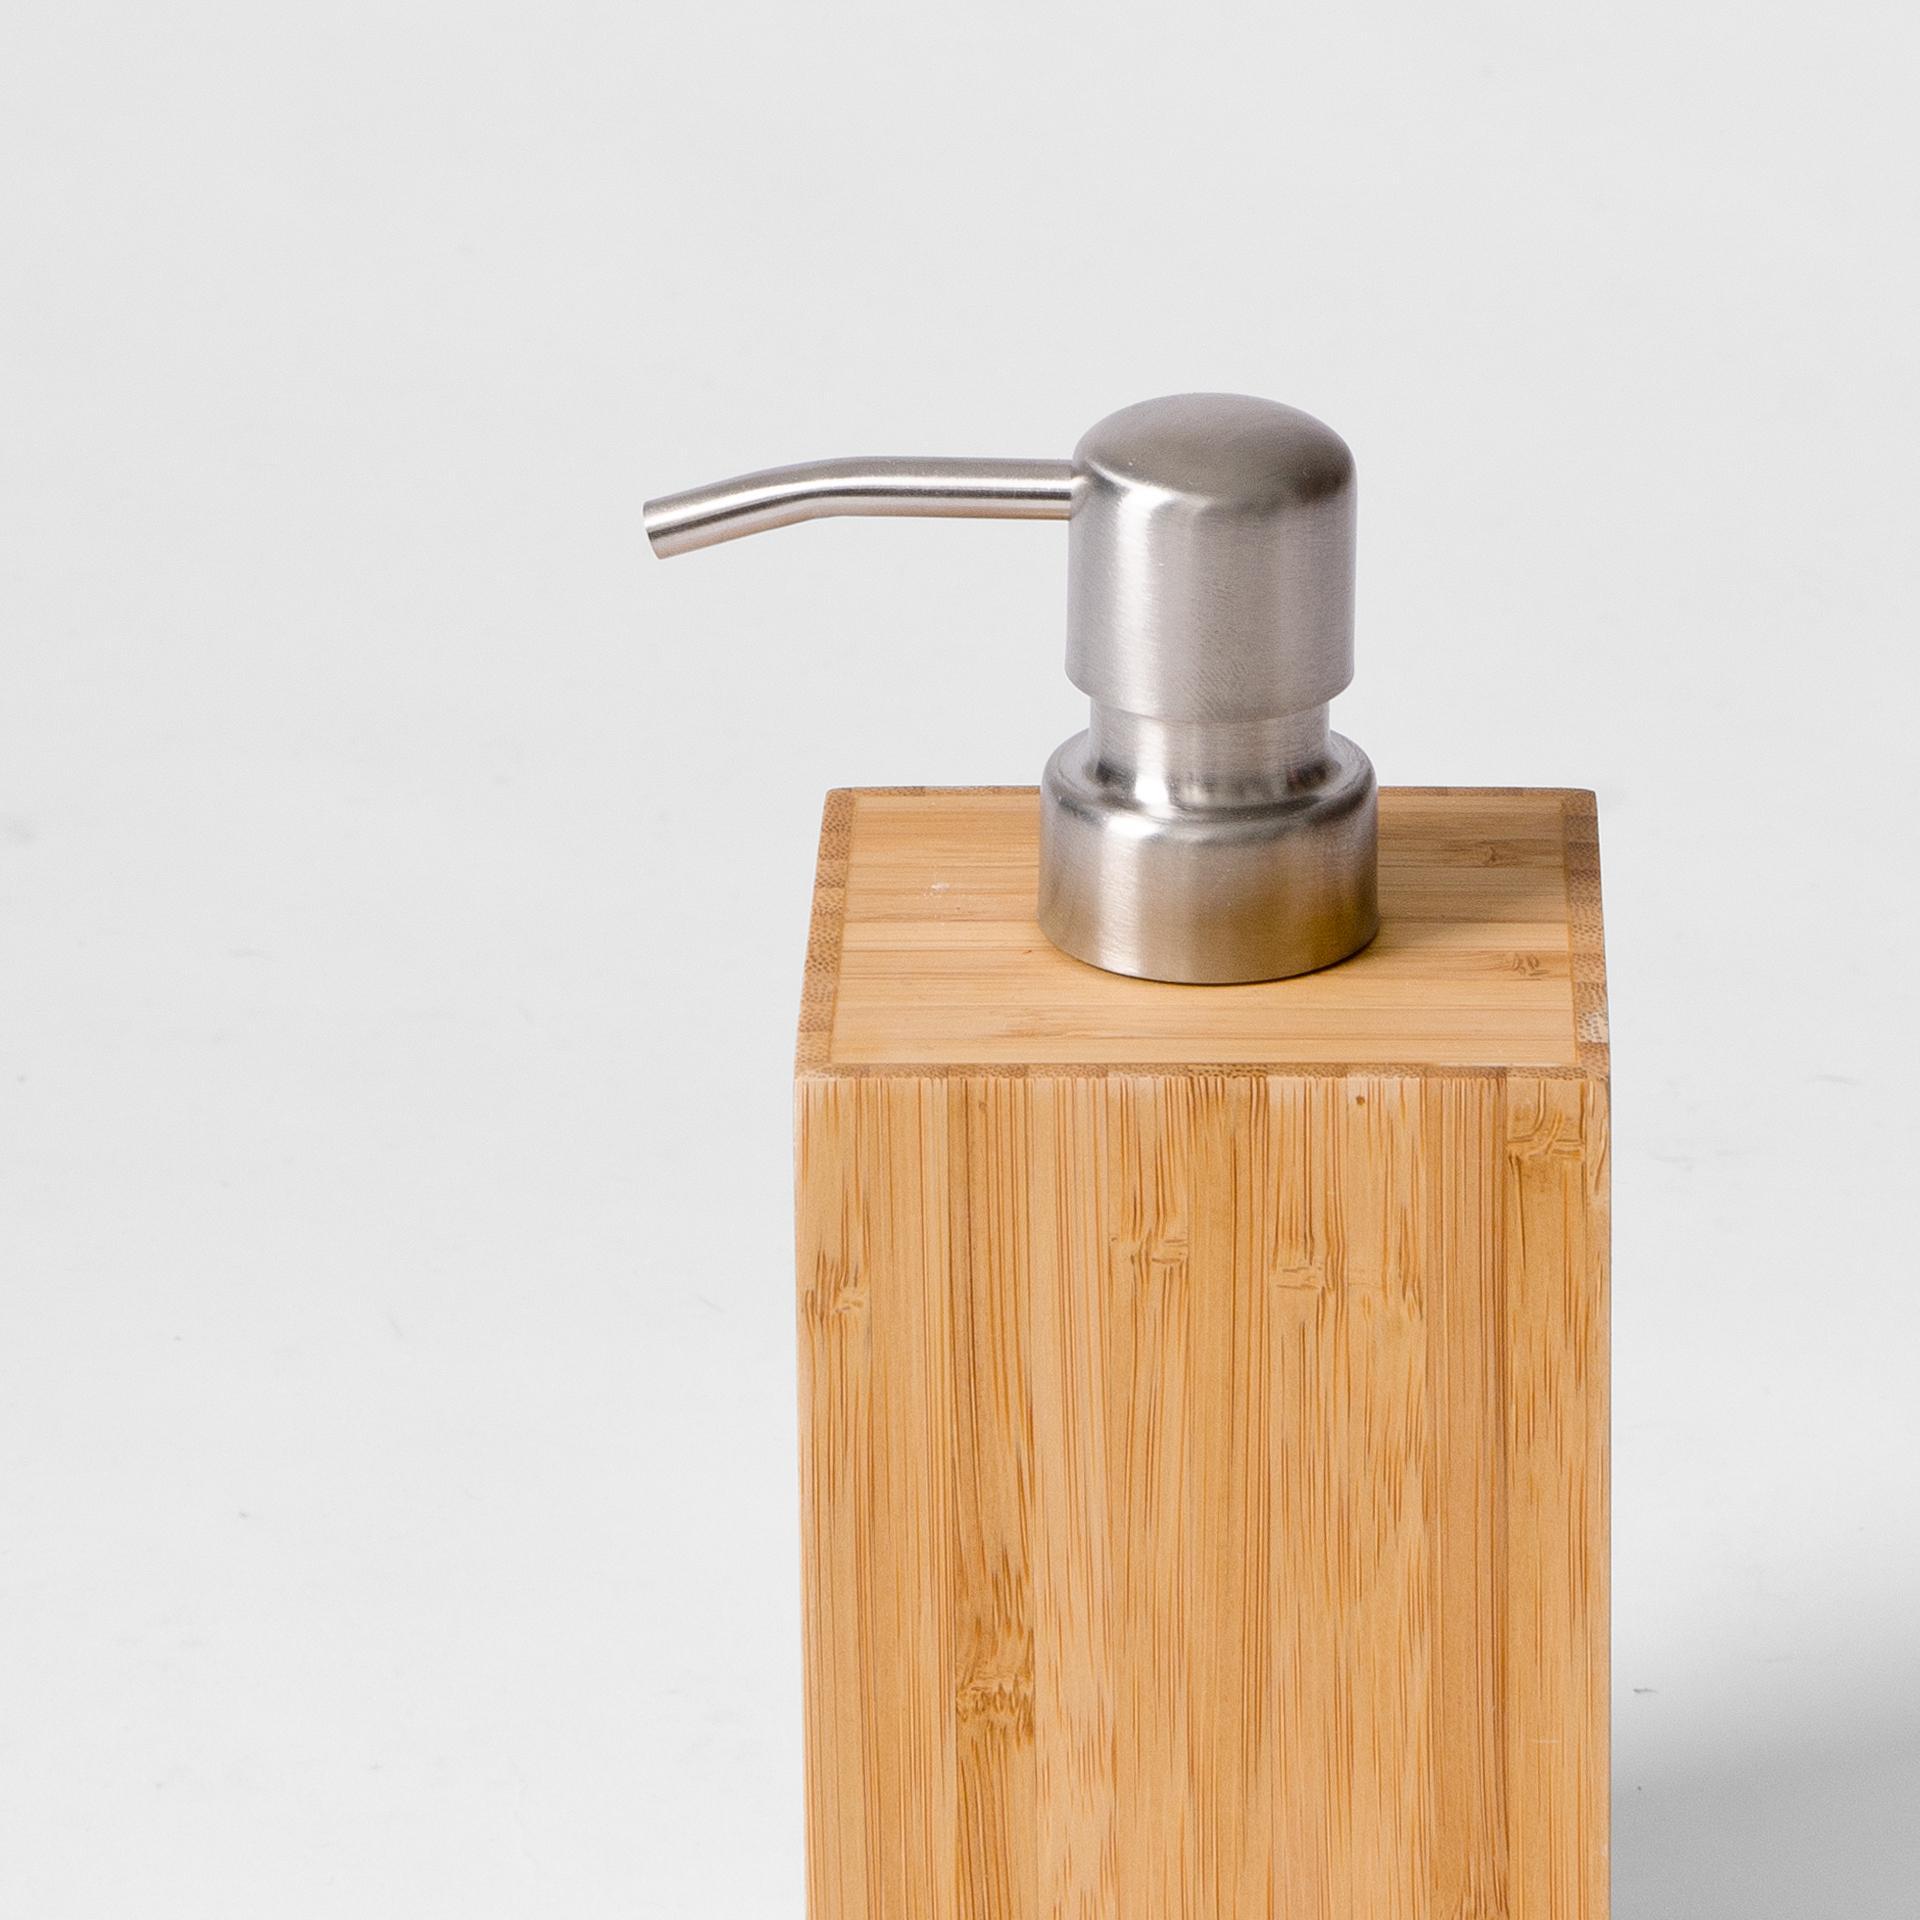 wireworks | soap pump mezza | Natural oak